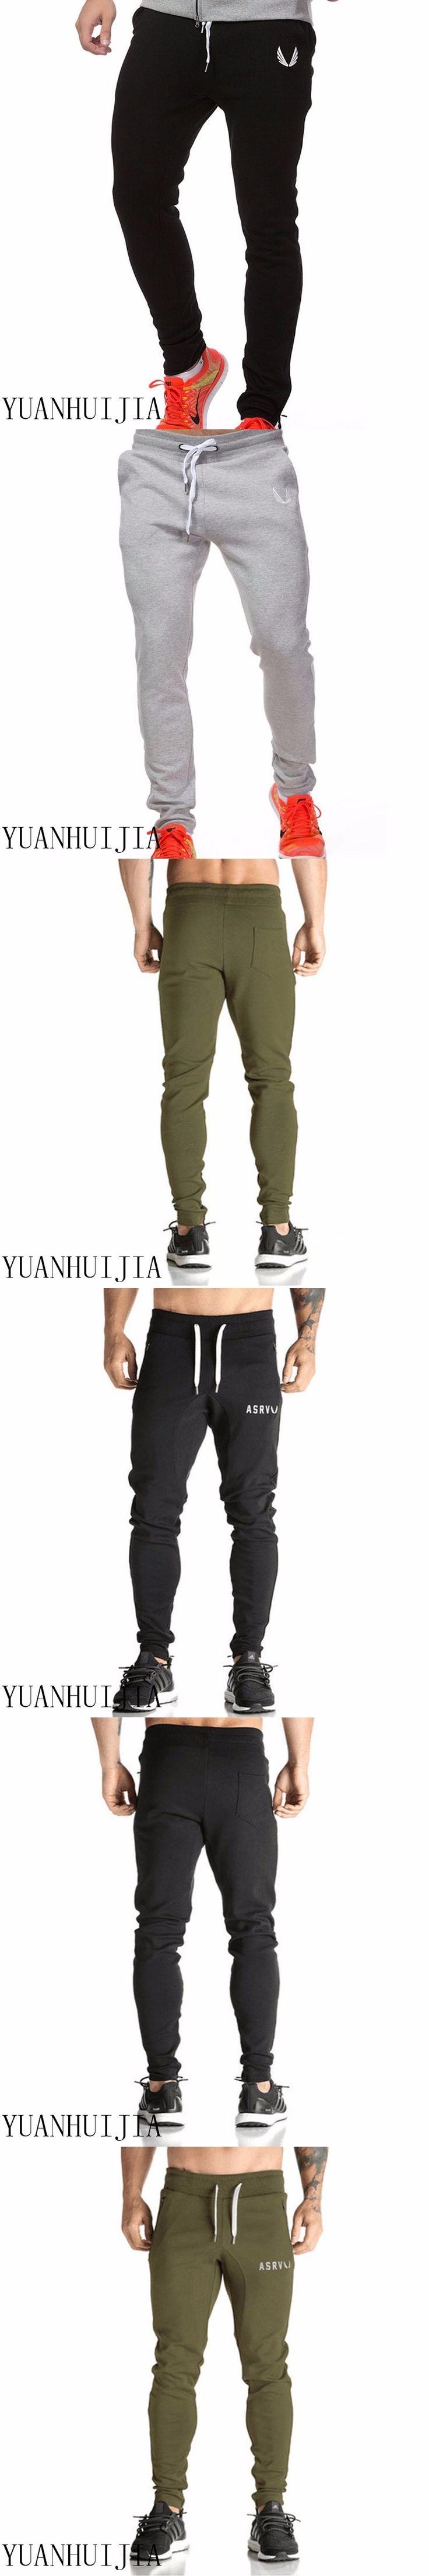 2017 New Fashion For Men KEYS & GOLDS Pants, Male Fitness Workout Pants  Trousers Sweatpants Jogger Pants M-XXL